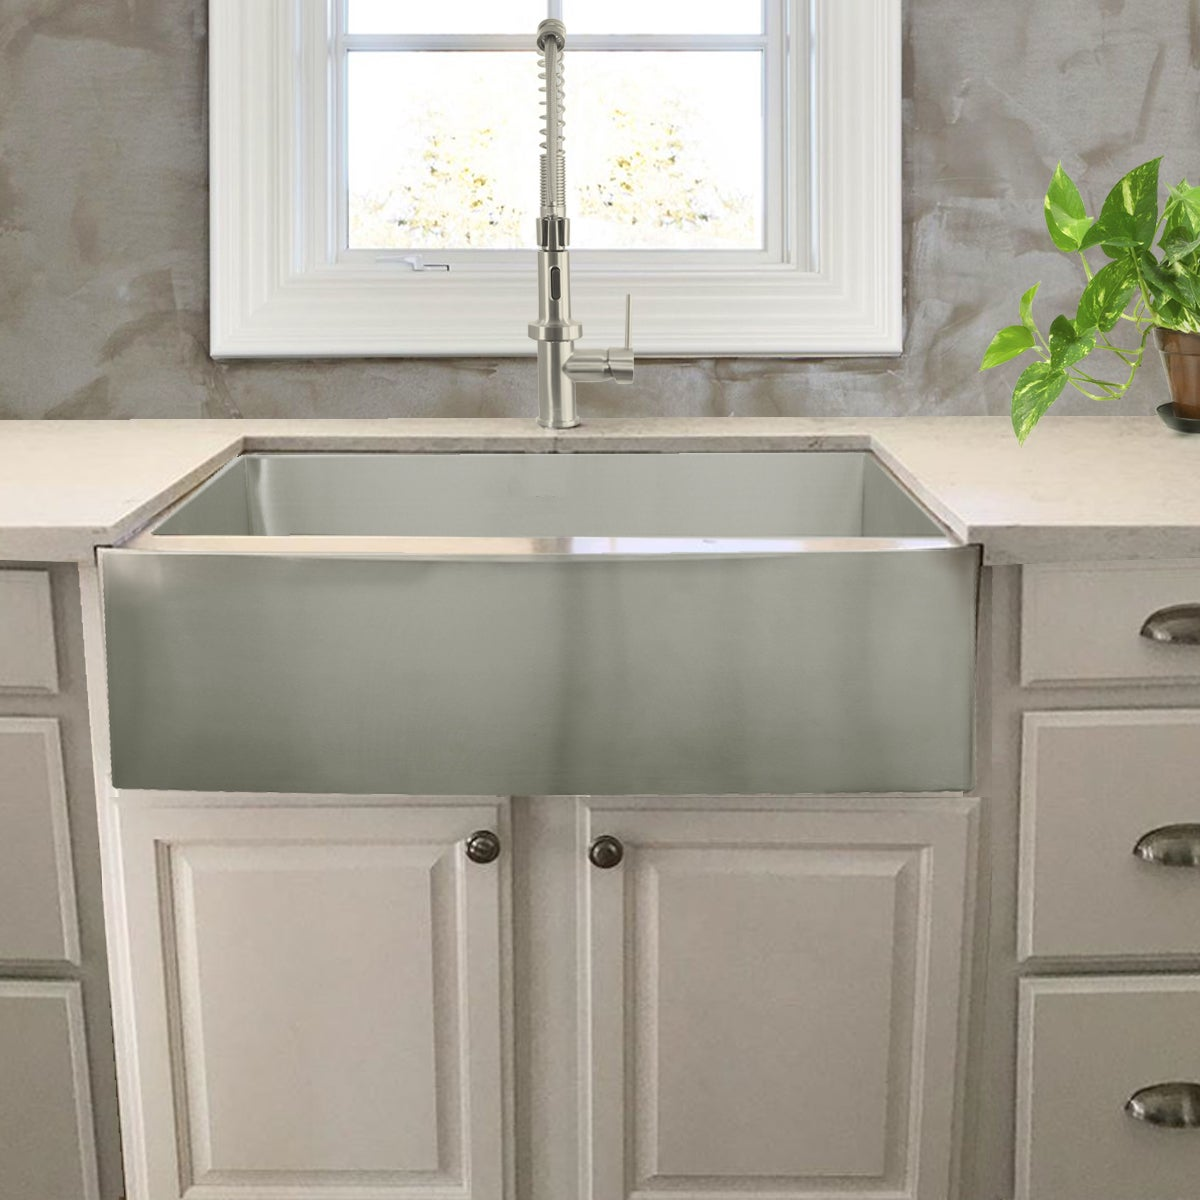 Shop Stainless Steel Single Bowl Apron Farmhouse Kitchen Sink With